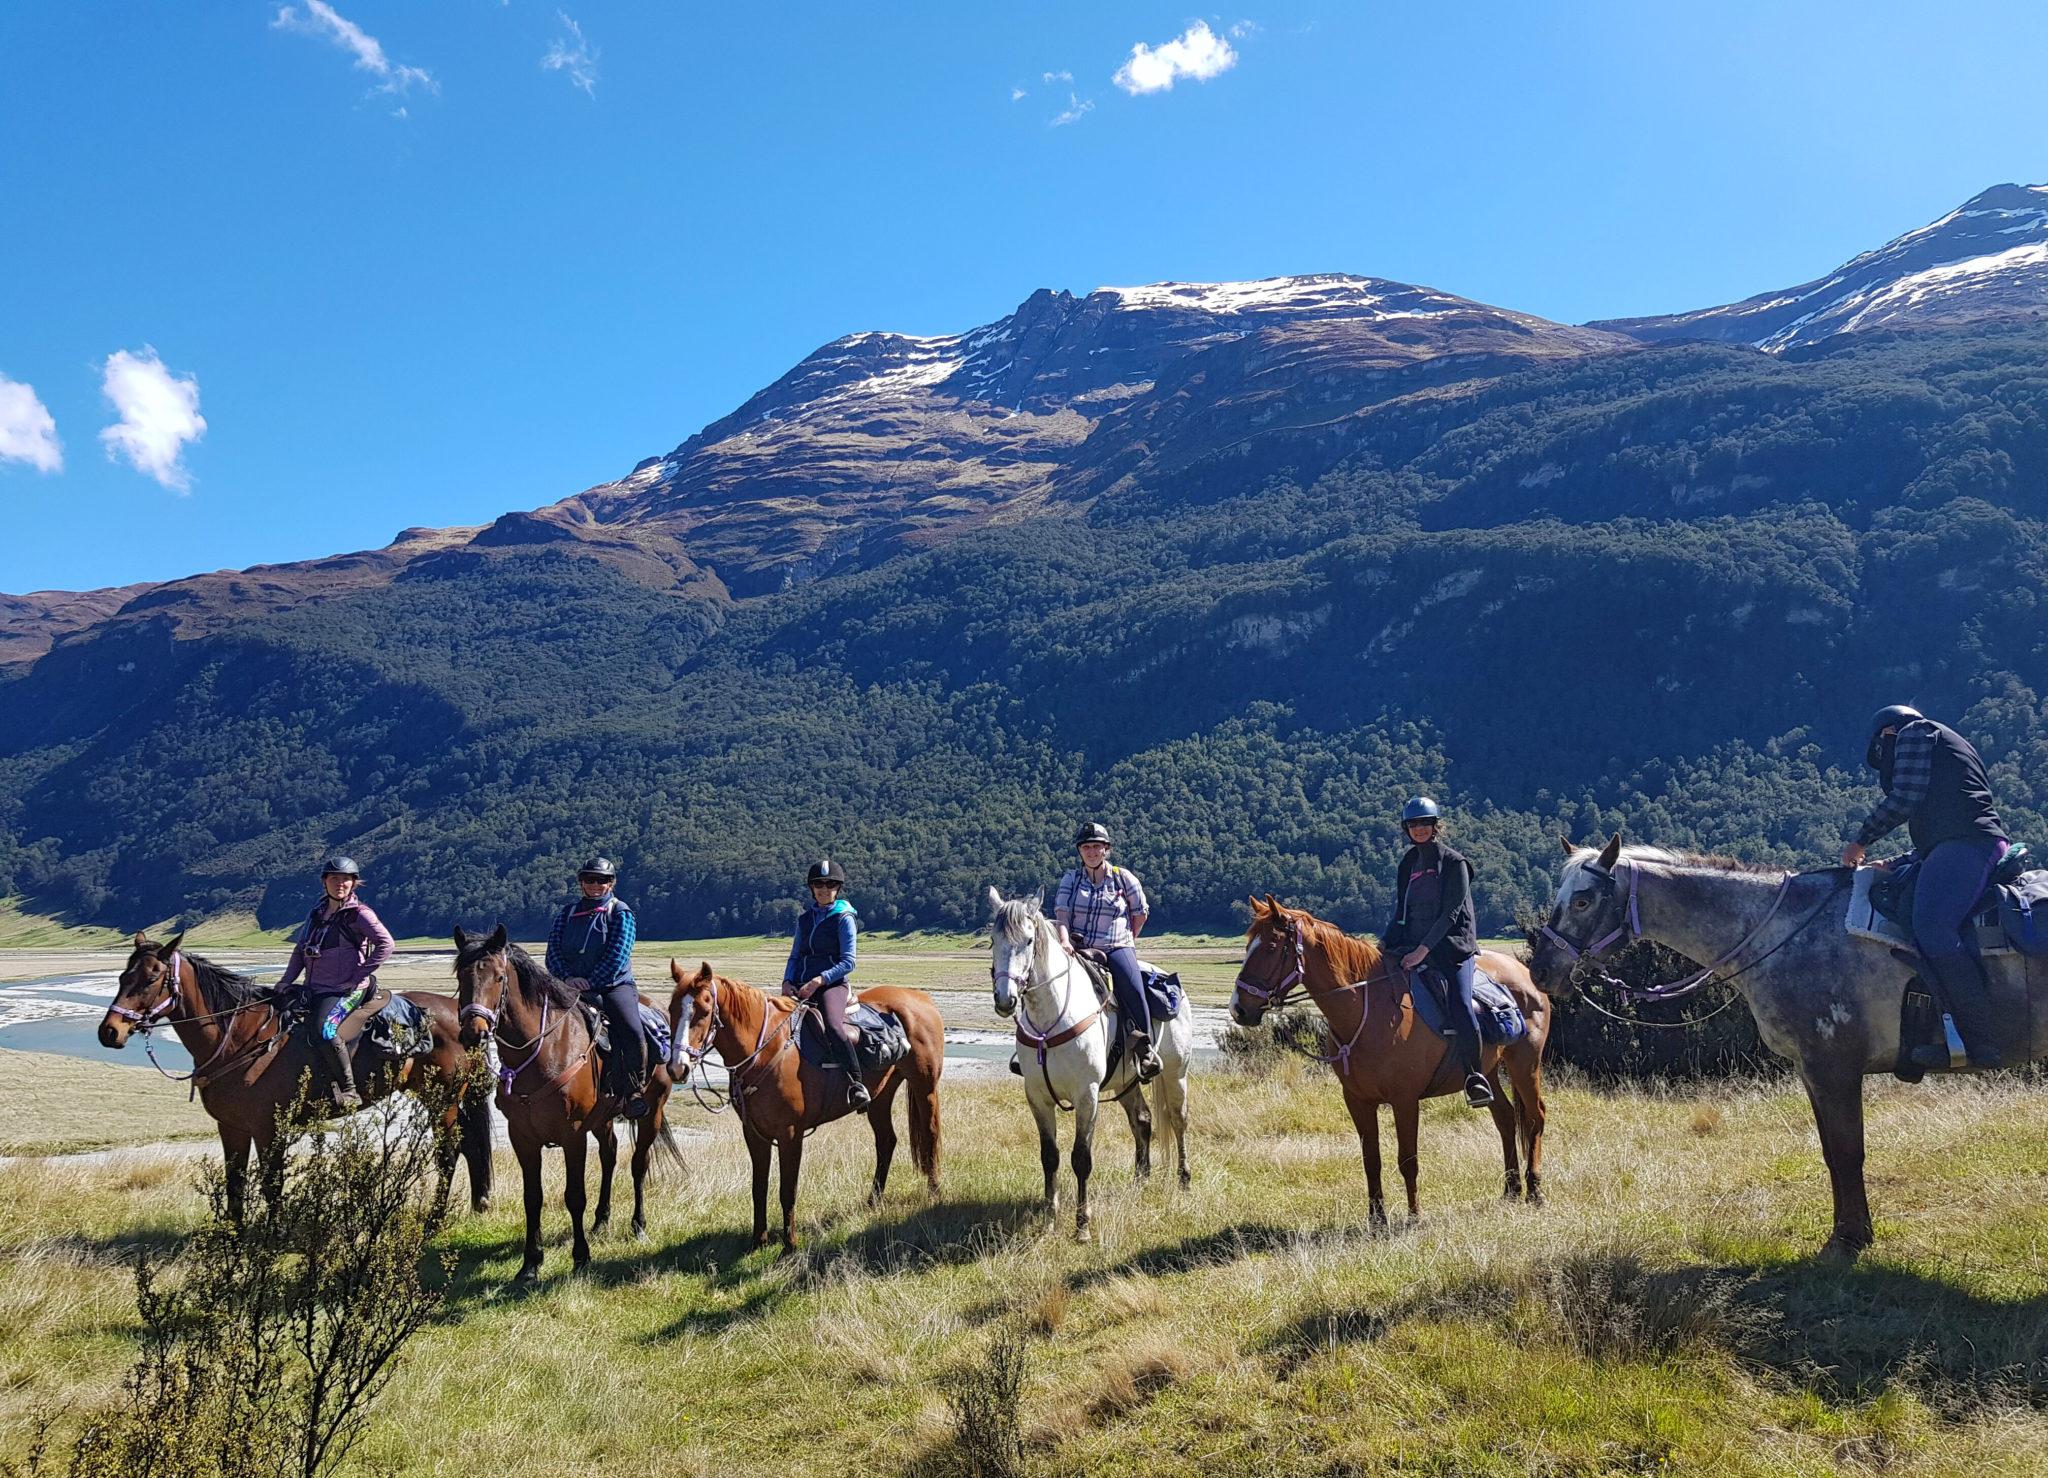 Glenorchy Back Country Ride, New Zealand - Globetrotting horse riding holidays